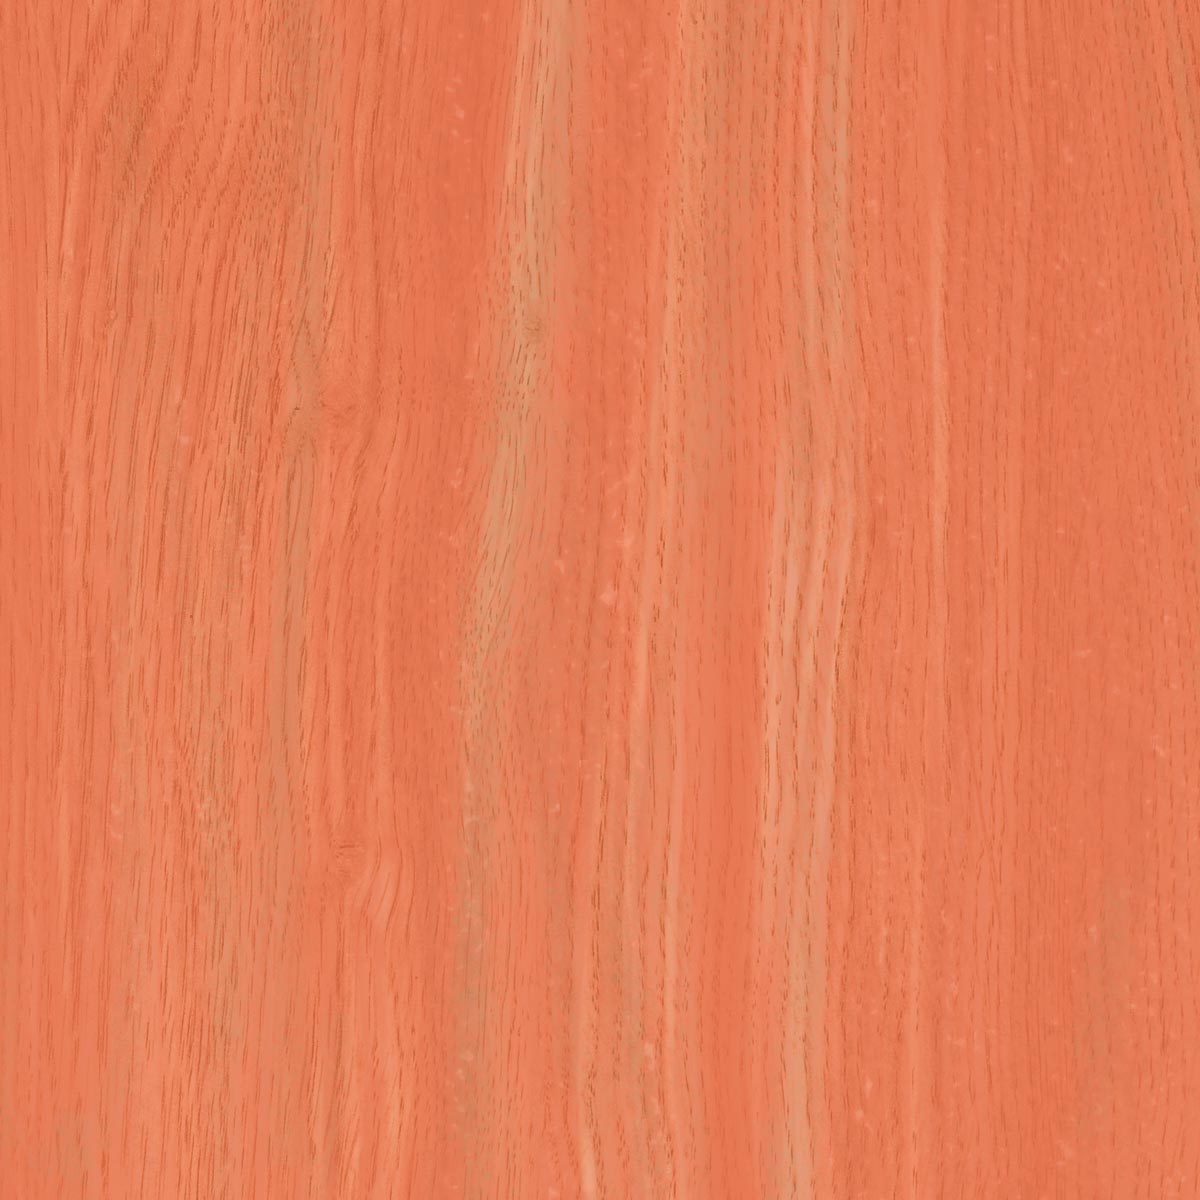 FolkArt ® Pickling Wash™ - Coral Beauty, 2 oz.